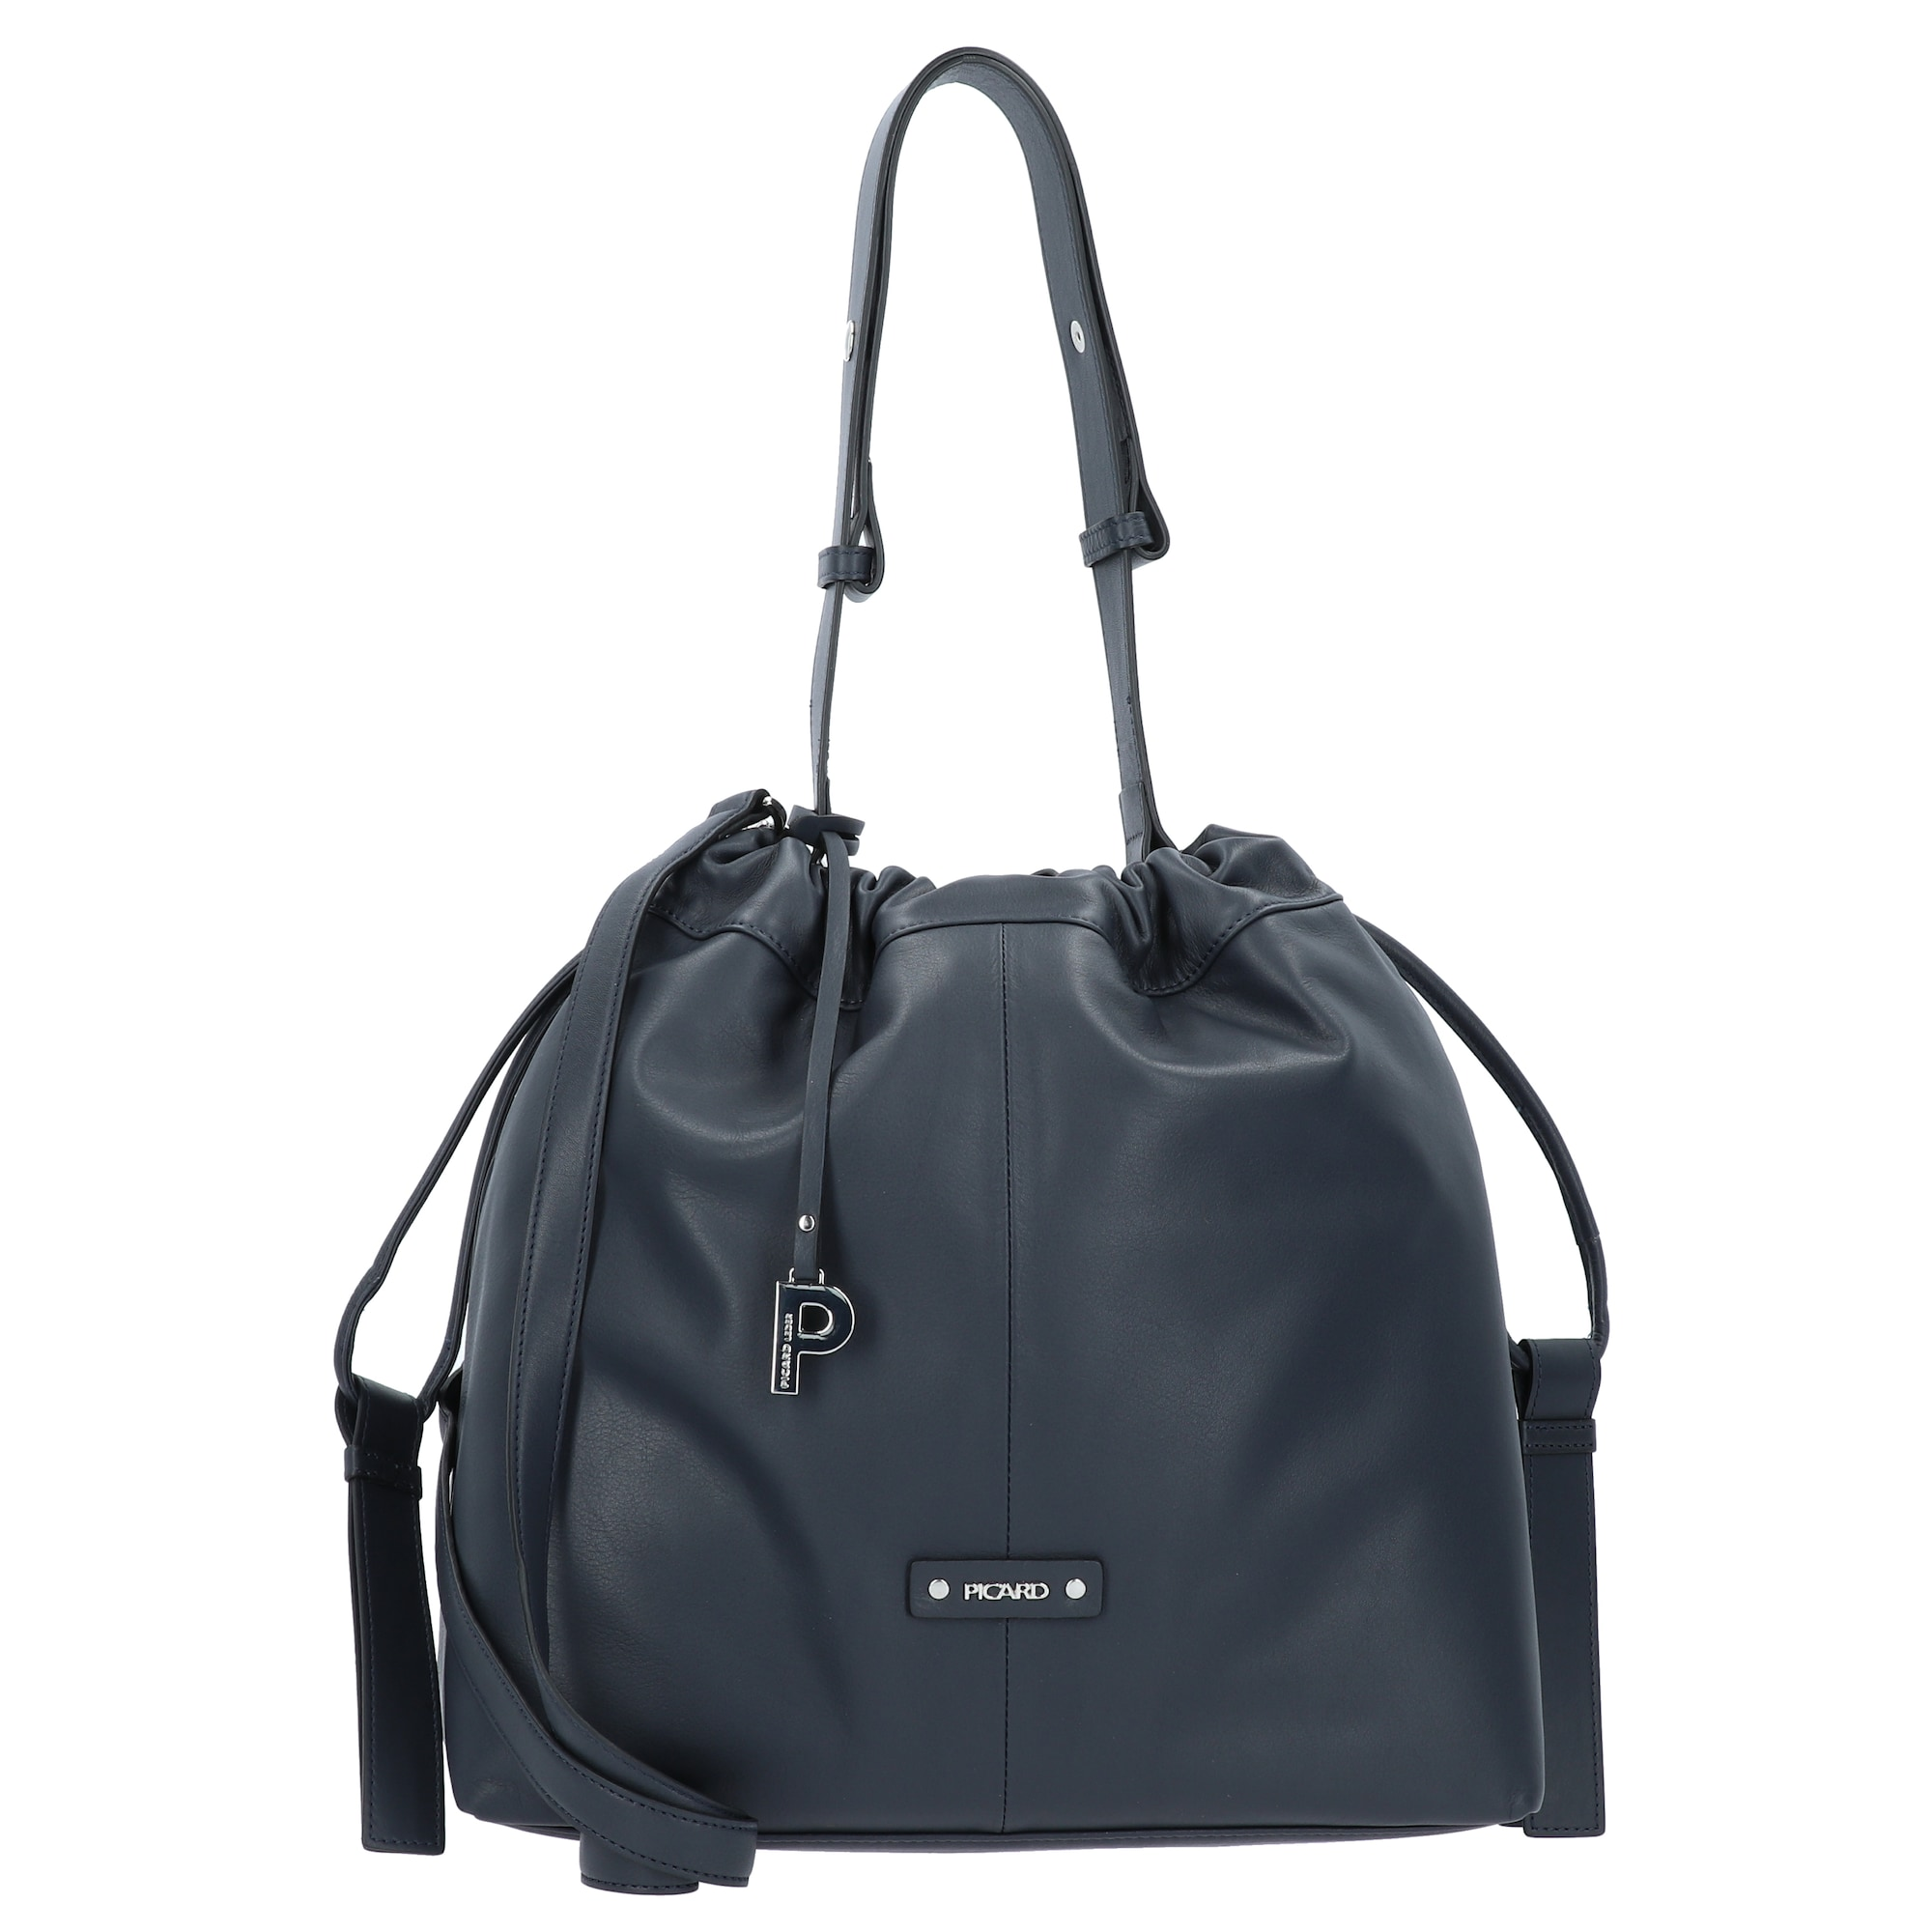 Beuteltasche   Taschen > Handtaschen > Beuteltaschen   Picard